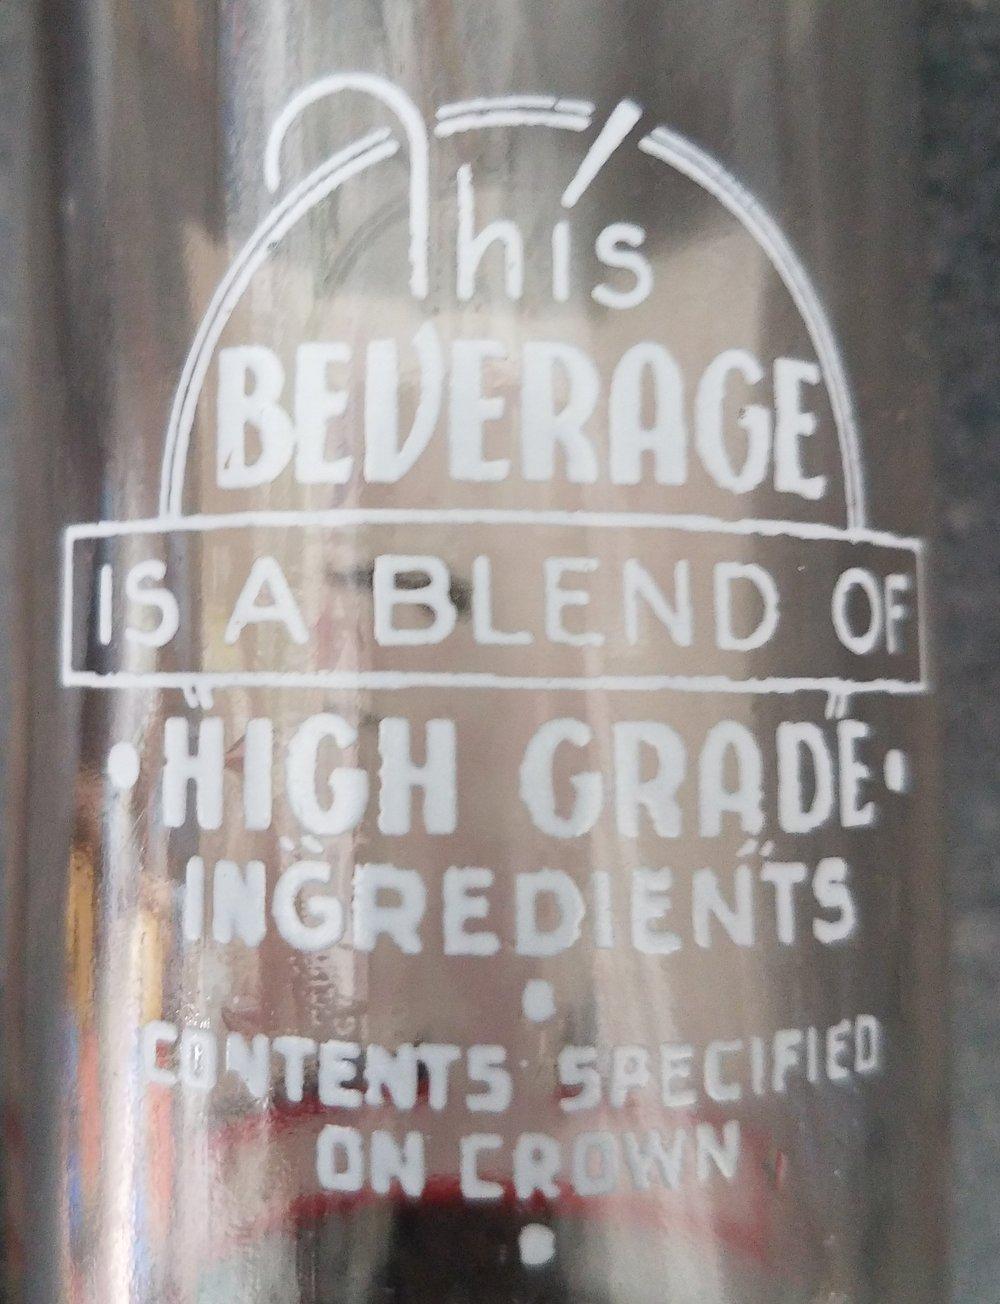 """High Grade"" Ingredients"